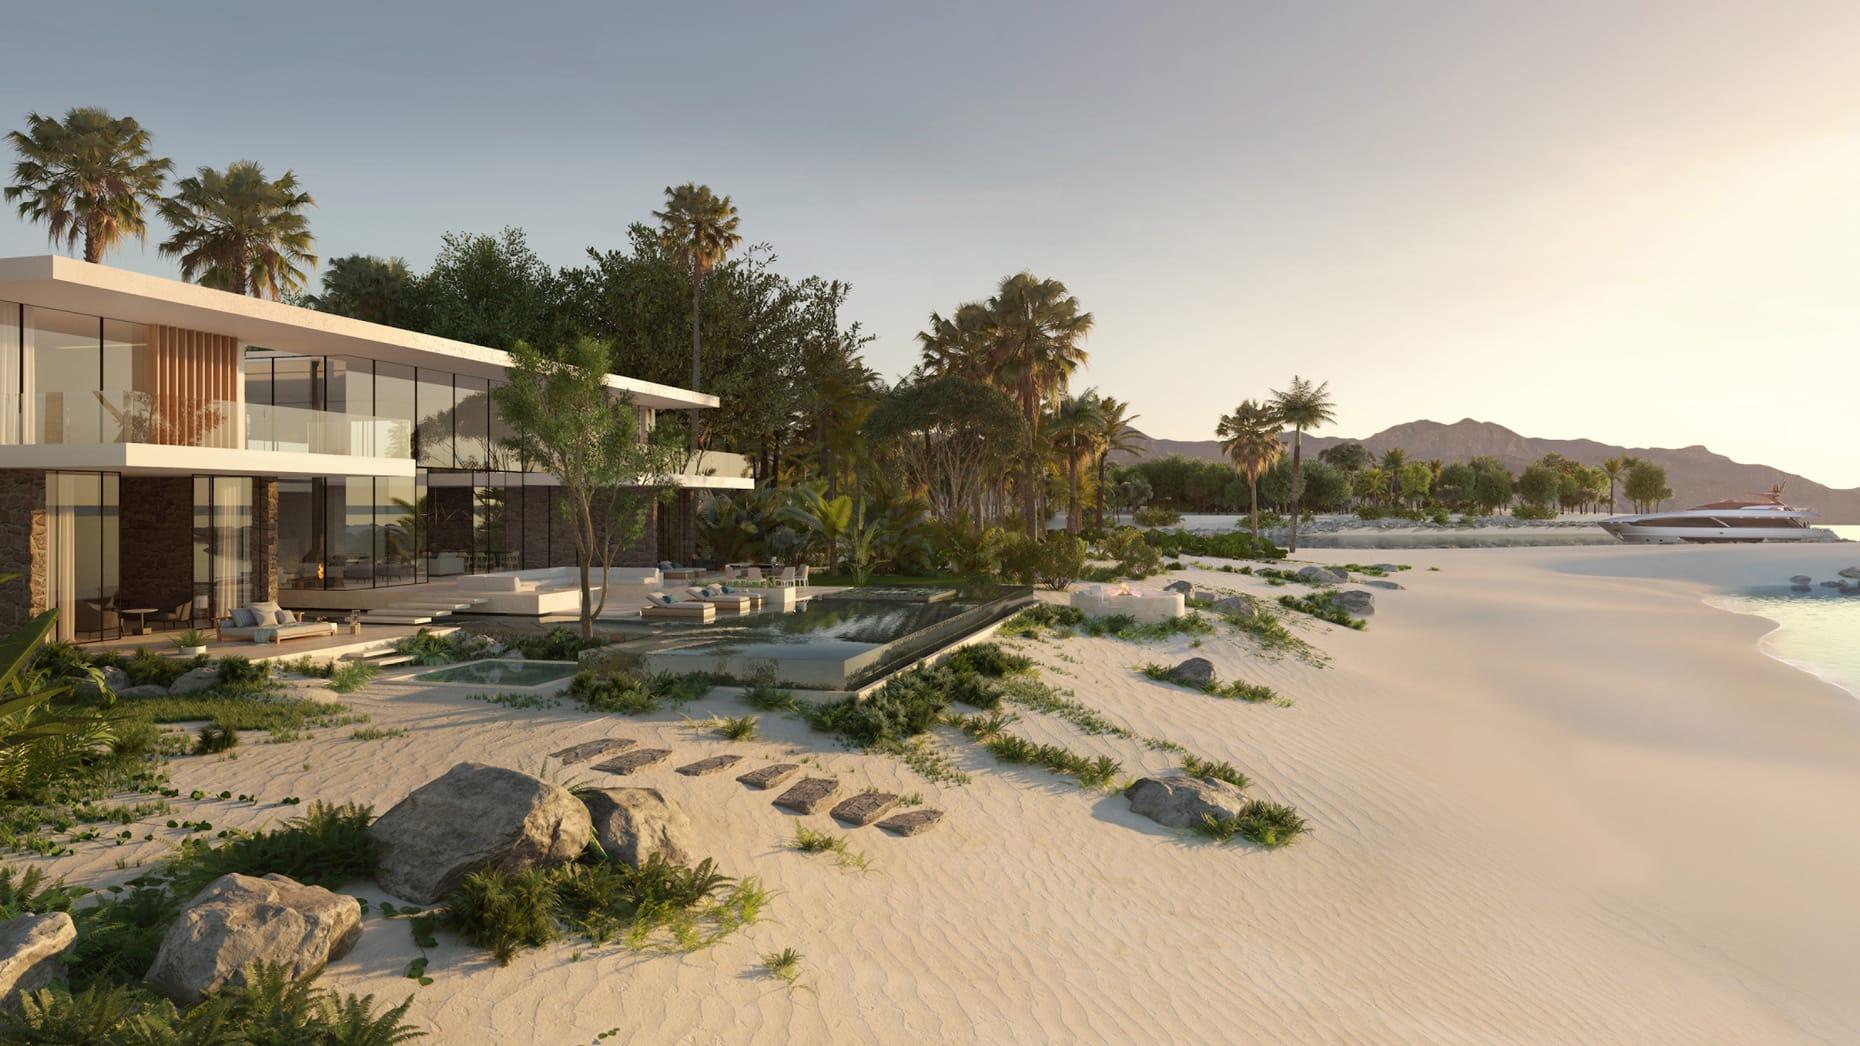 Four Seasons Private Residences Los Cabos at Costa Palmas